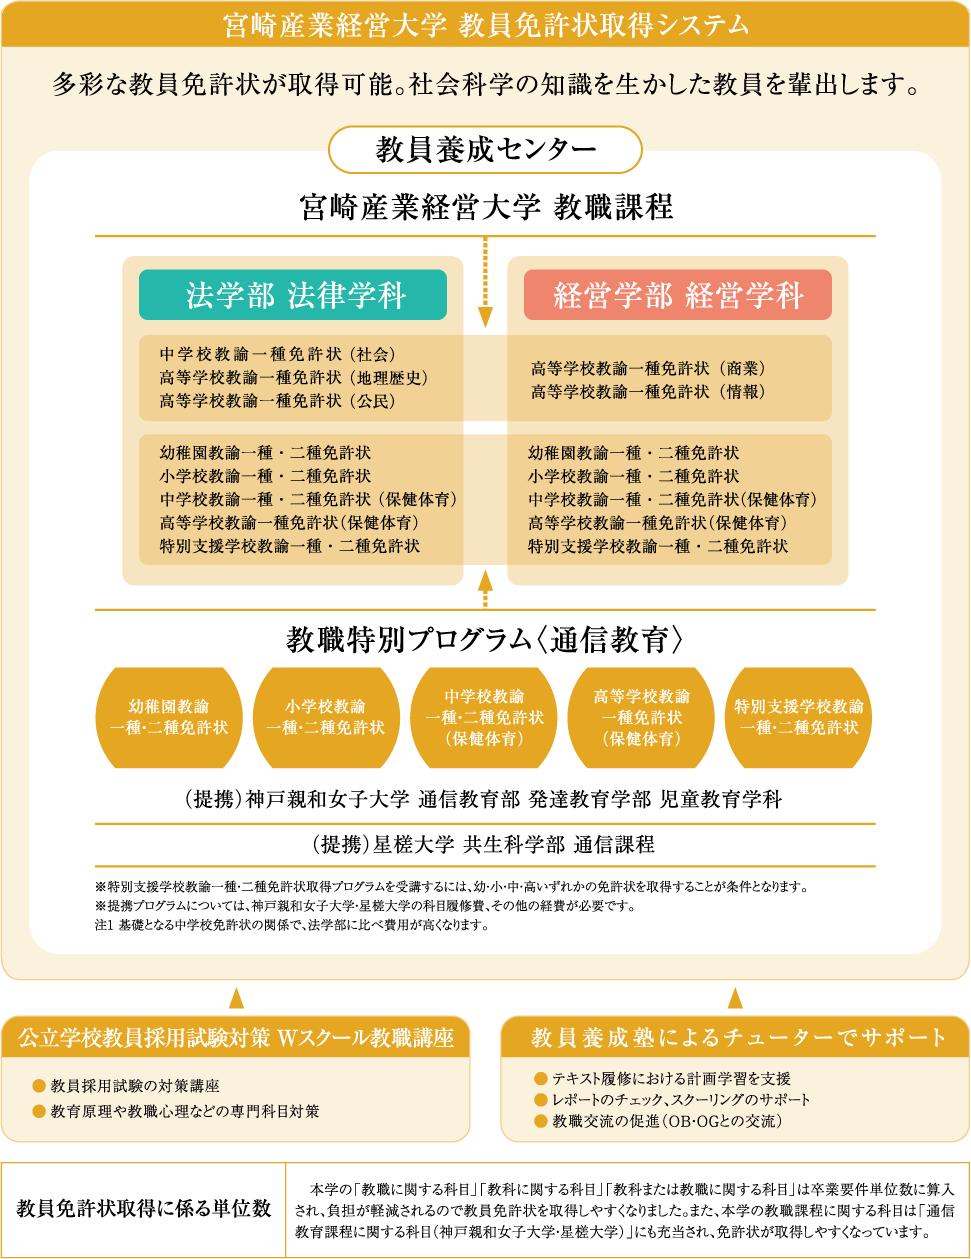 宮崎産業経営大学 教員免許状取得システム